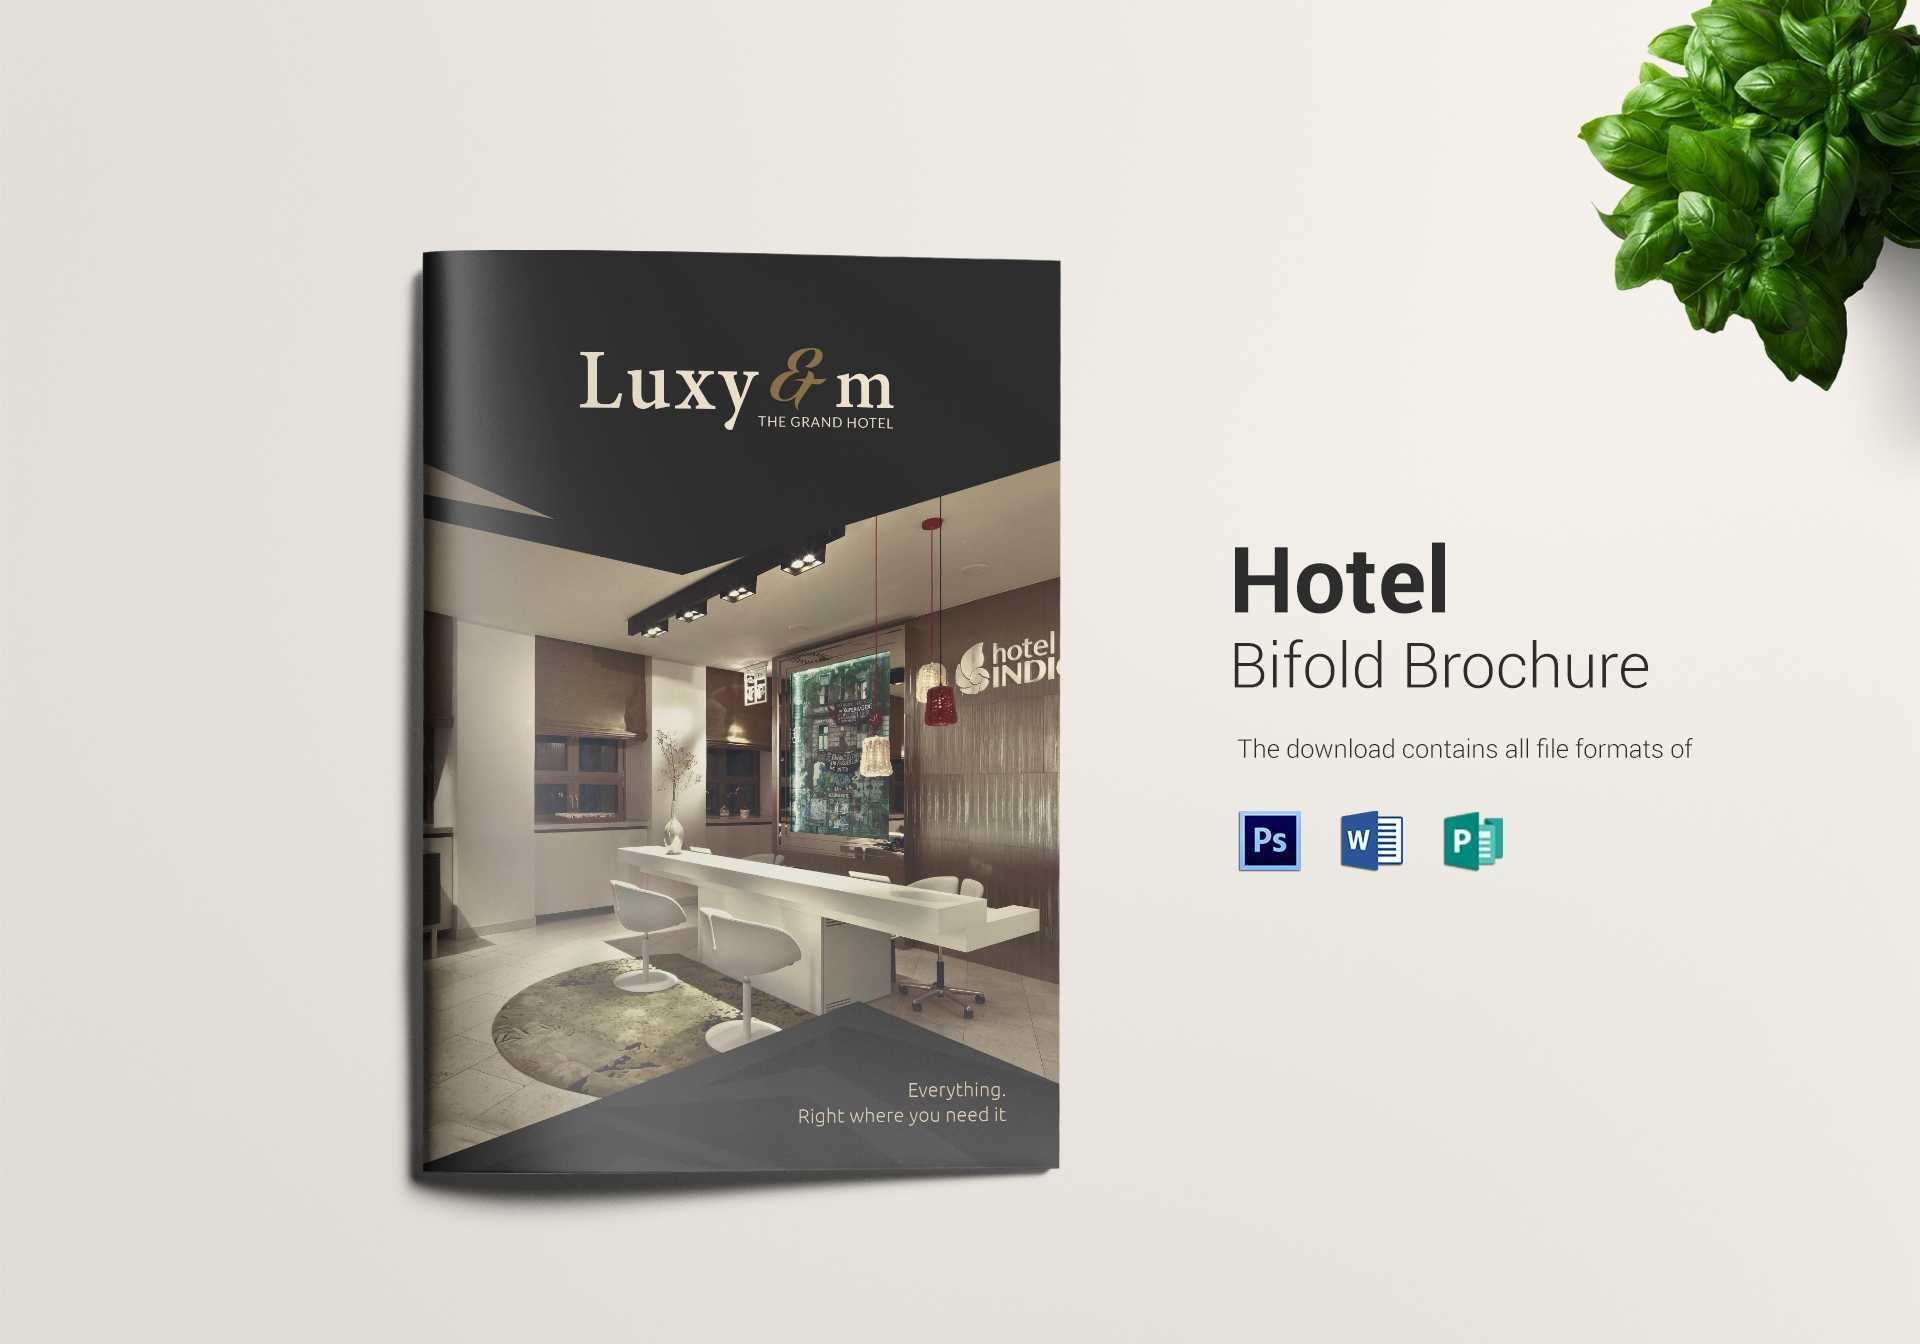 Hotel And Motel Bi Fold Brochure Template regarding Hotel Brochure Design Templates